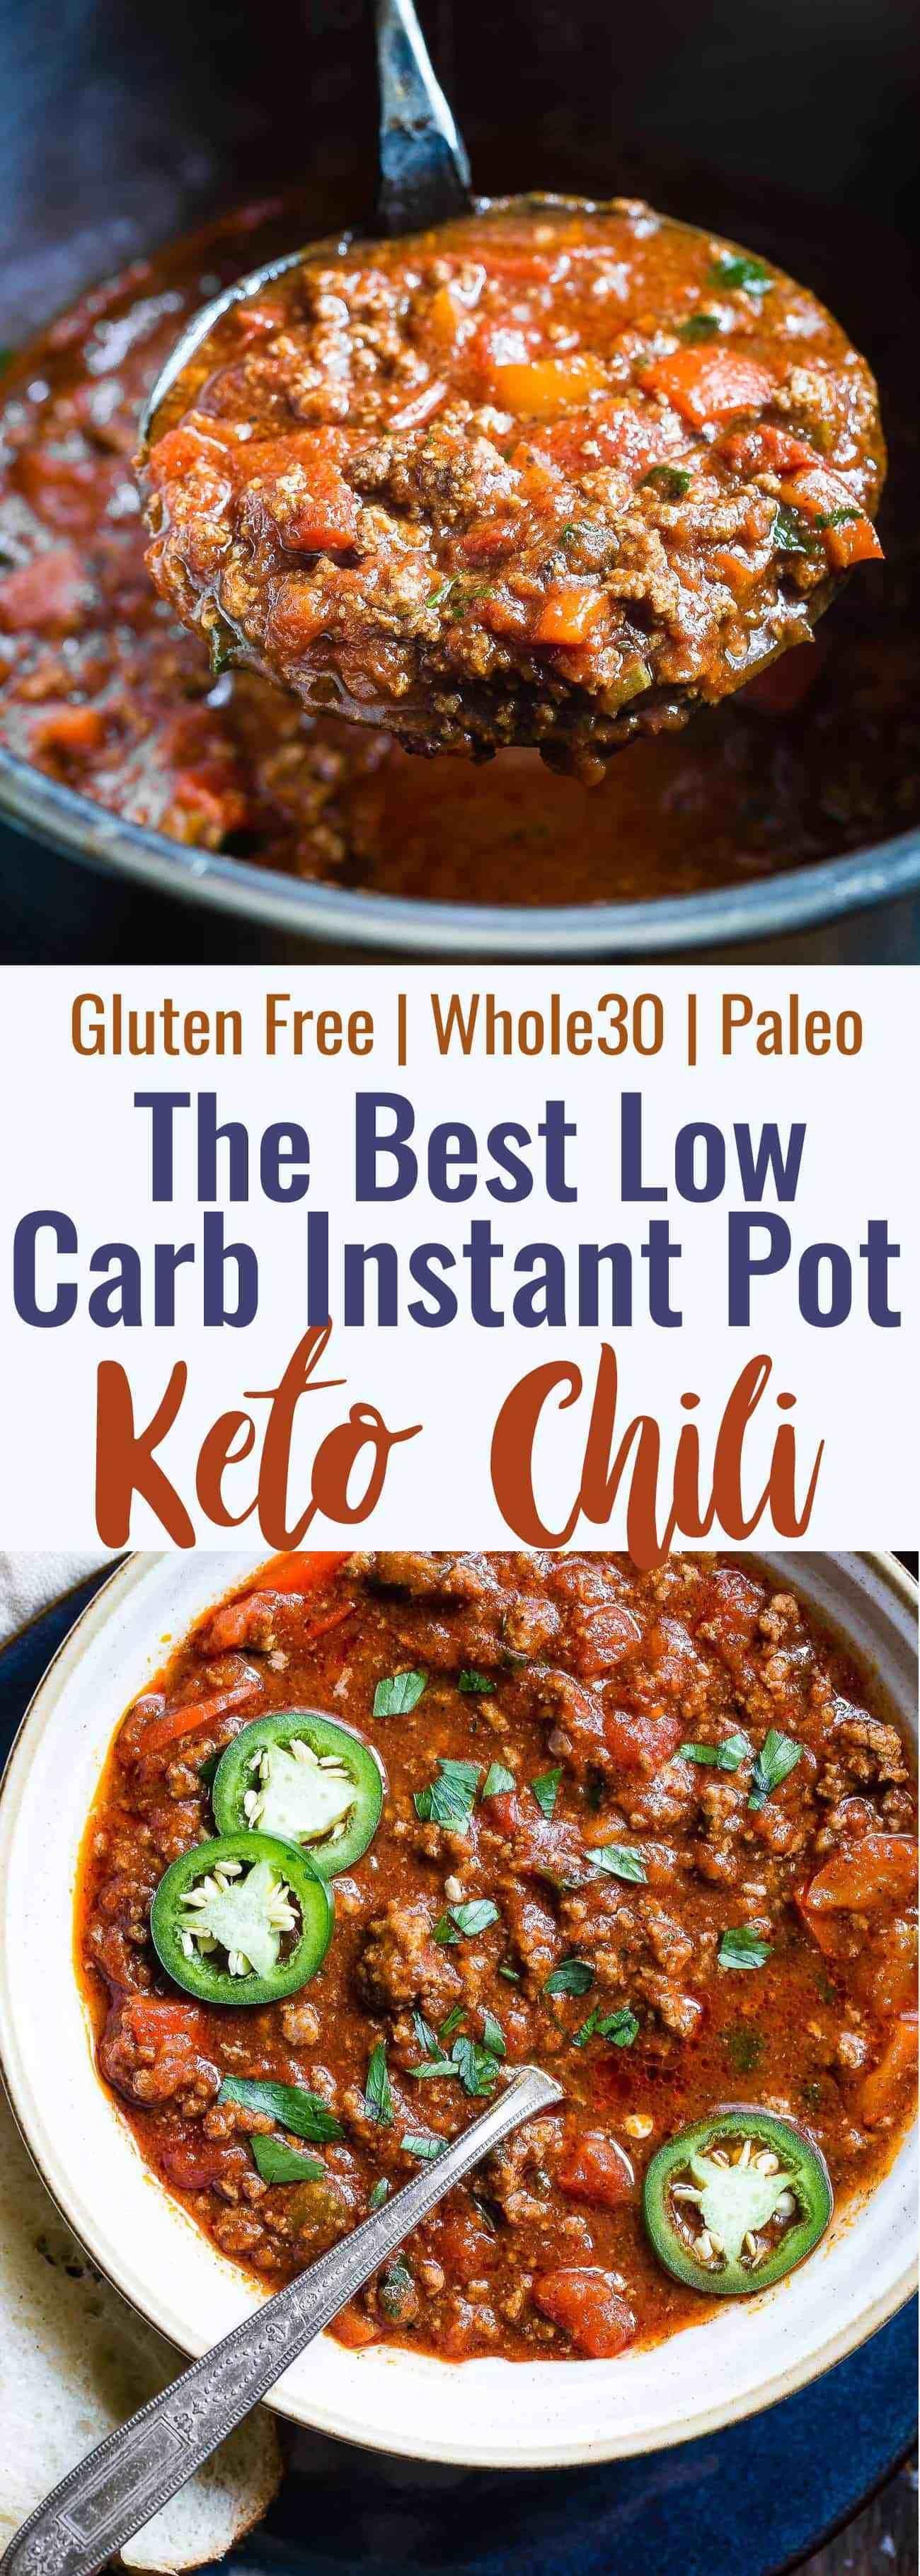 No Bean Whole30 Keto Chili in the Instant Pot (Paleo) | Food Faith Fitness, Baking #Bean #Chili #Fai...